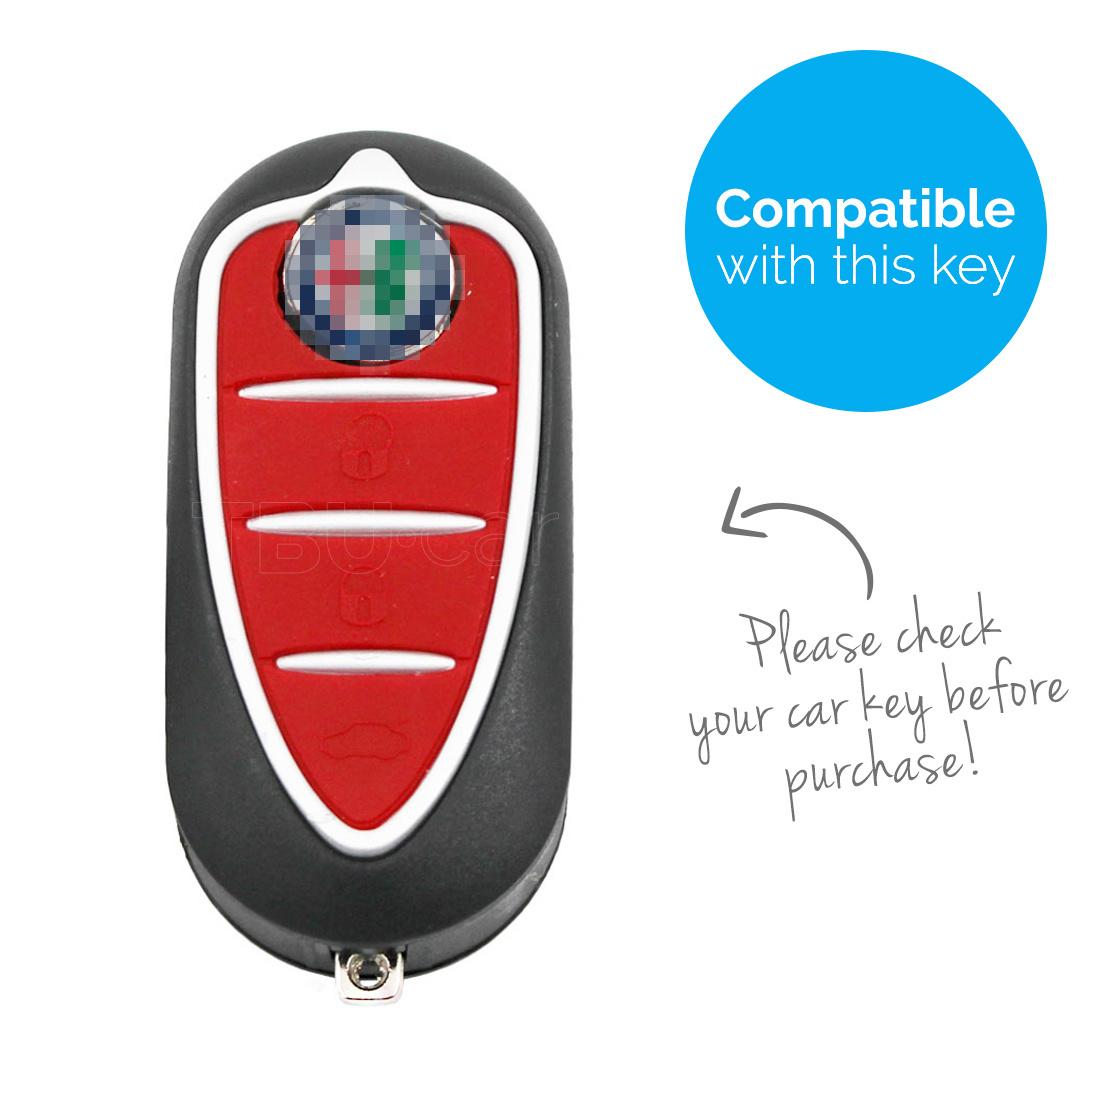 TBU car TBU car Funda Carcasa llave compatible con Alfa Romeo - Funda de Silicona - Cover de Llave Coche - Azul claro